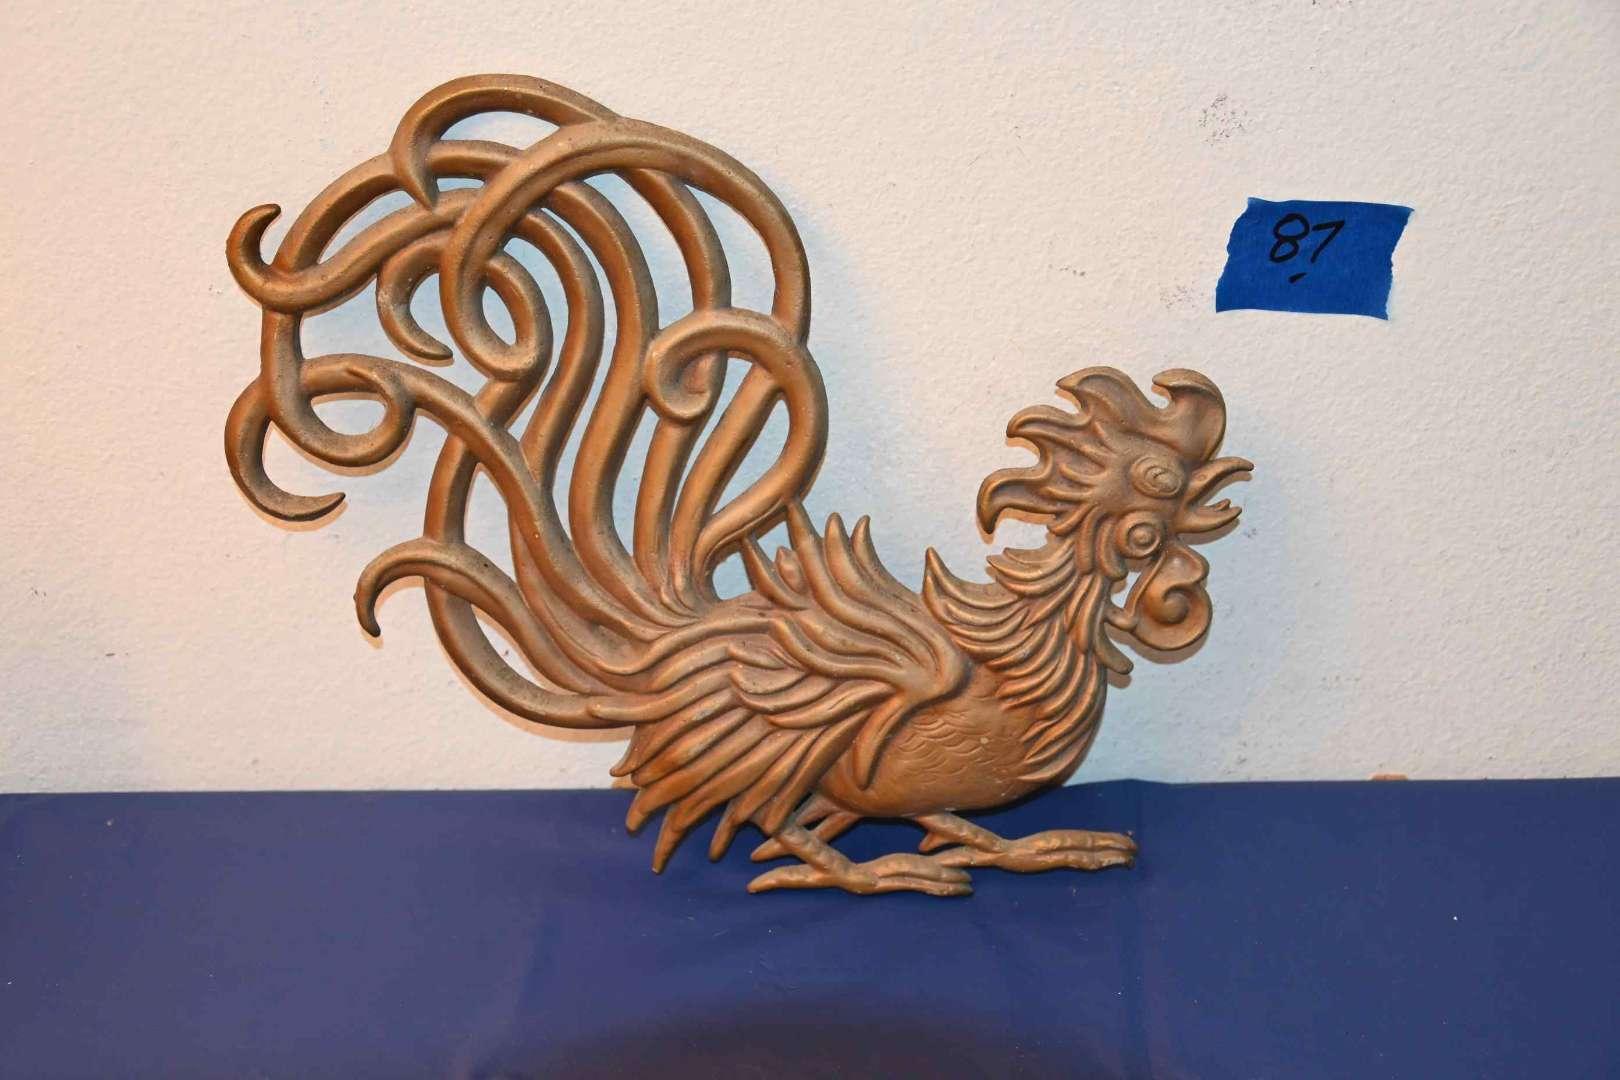 Lot # 87 VERMAY aluminum rooster wall art